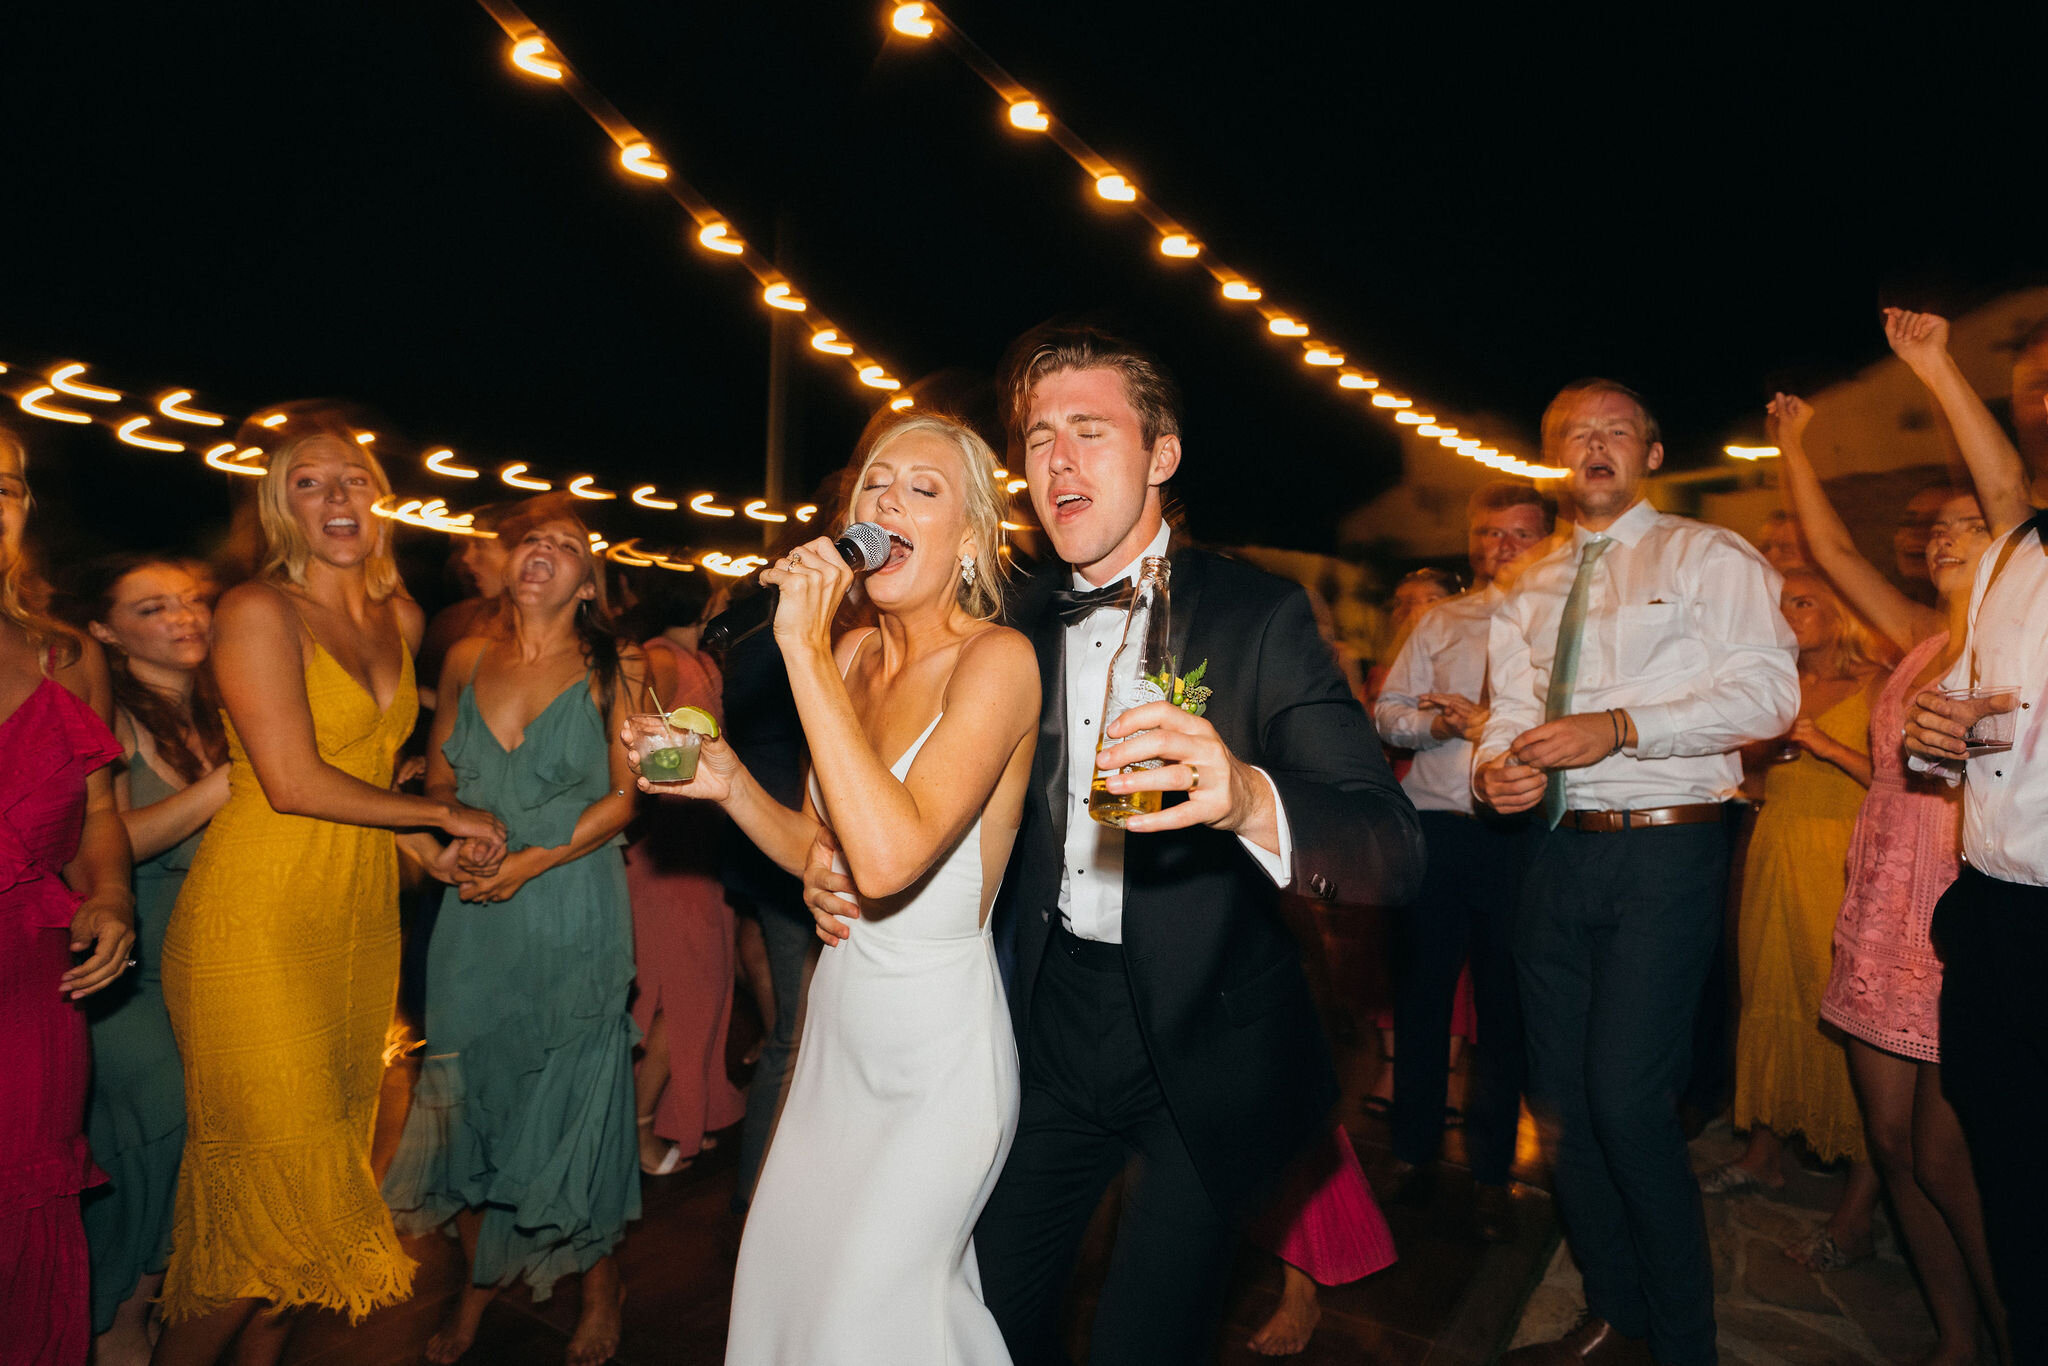 adamson-house-wedding-photography-184.jpg